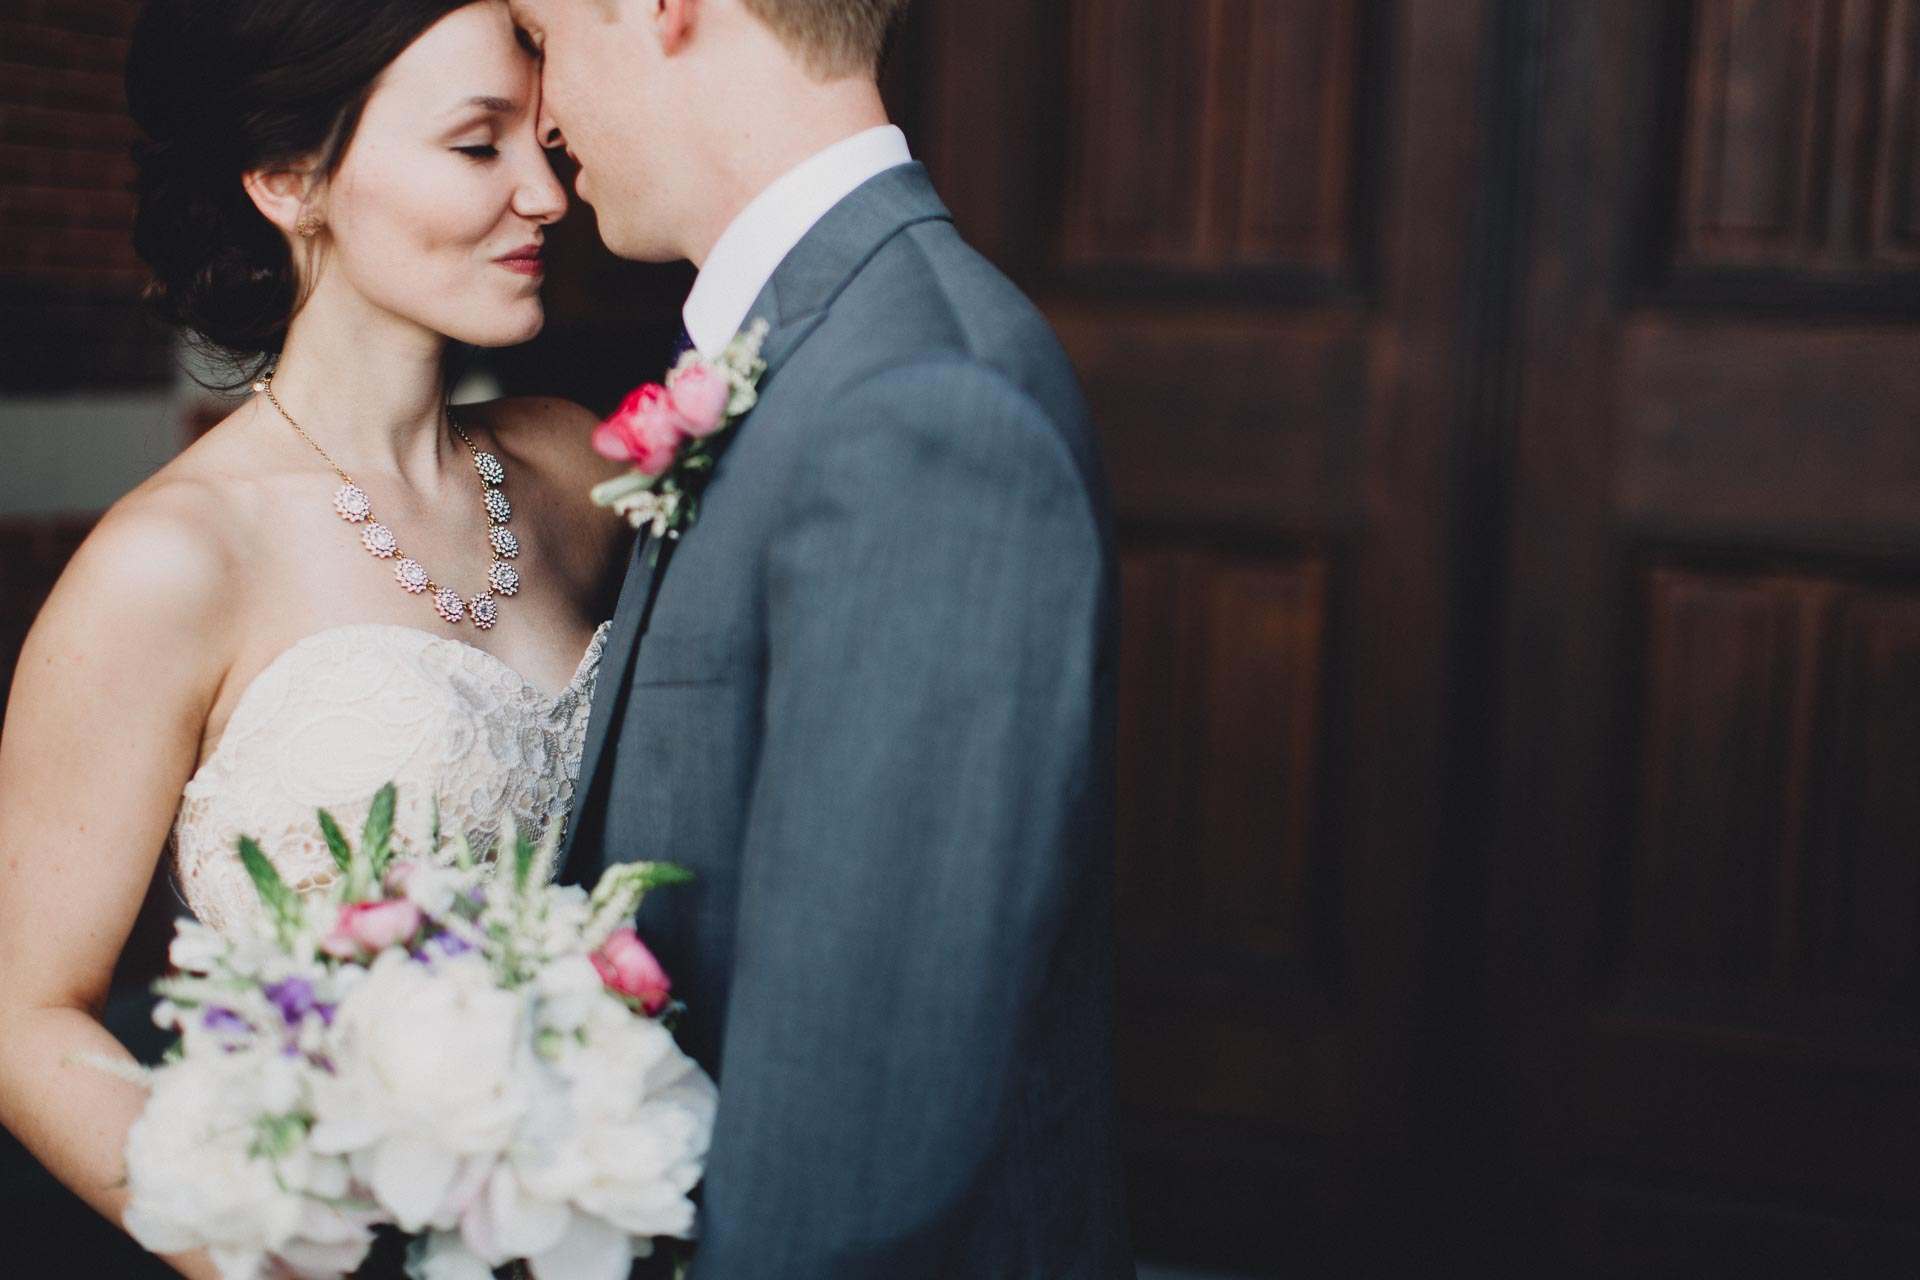 Julia-Michael-Cincinnati-Music-Hall-Wedding-075@2x.jpg